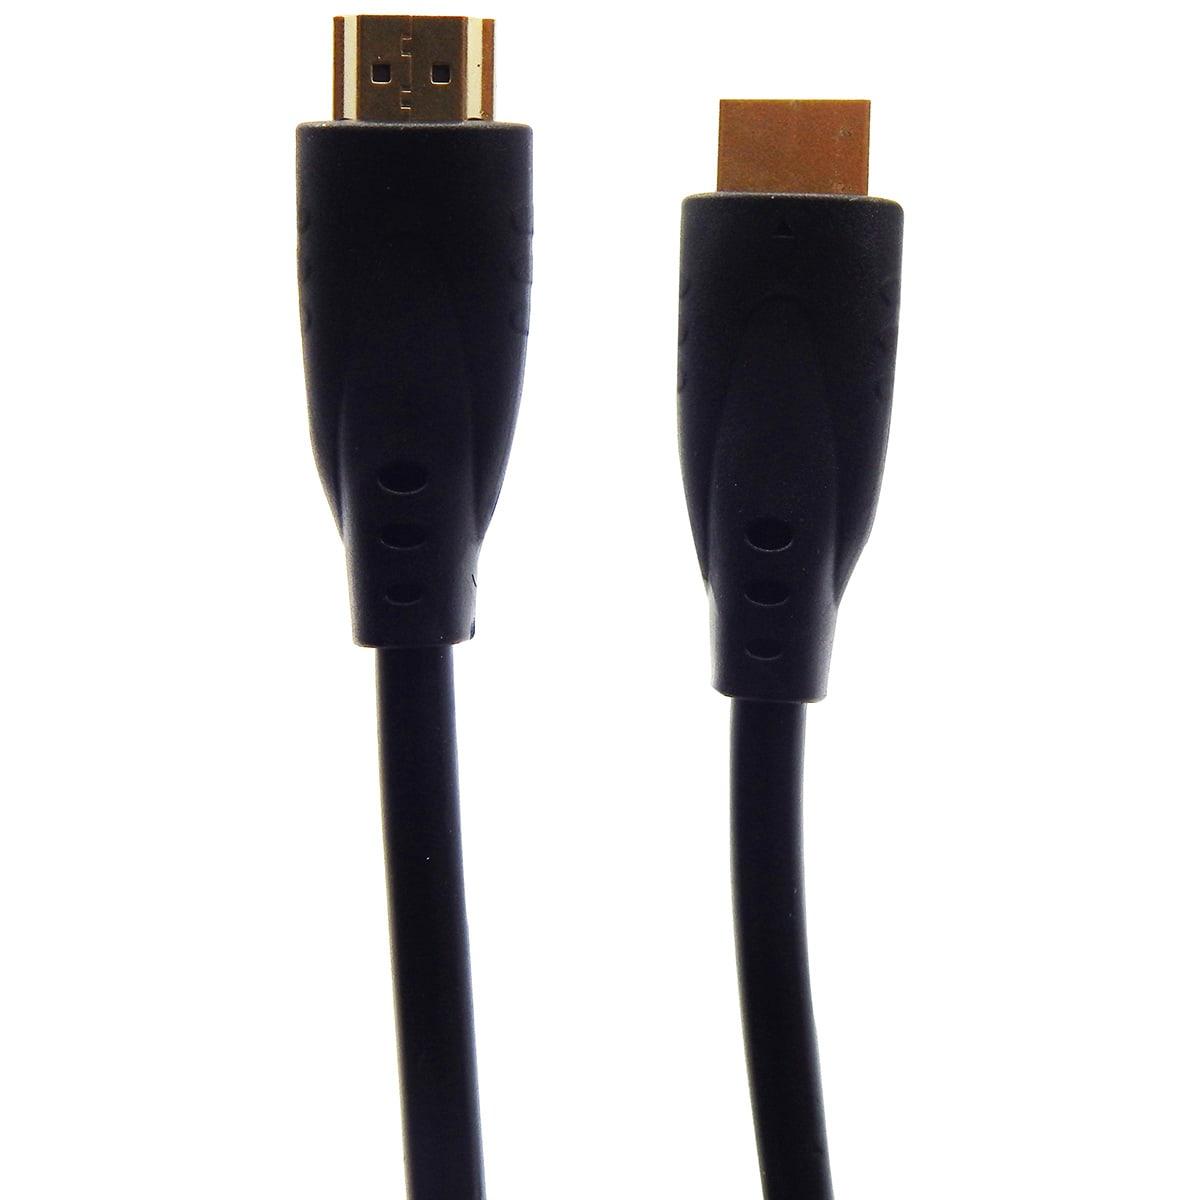 Cabo HDMI 1.4 1,8 Metros Blindado Exbom CBX-H18SM